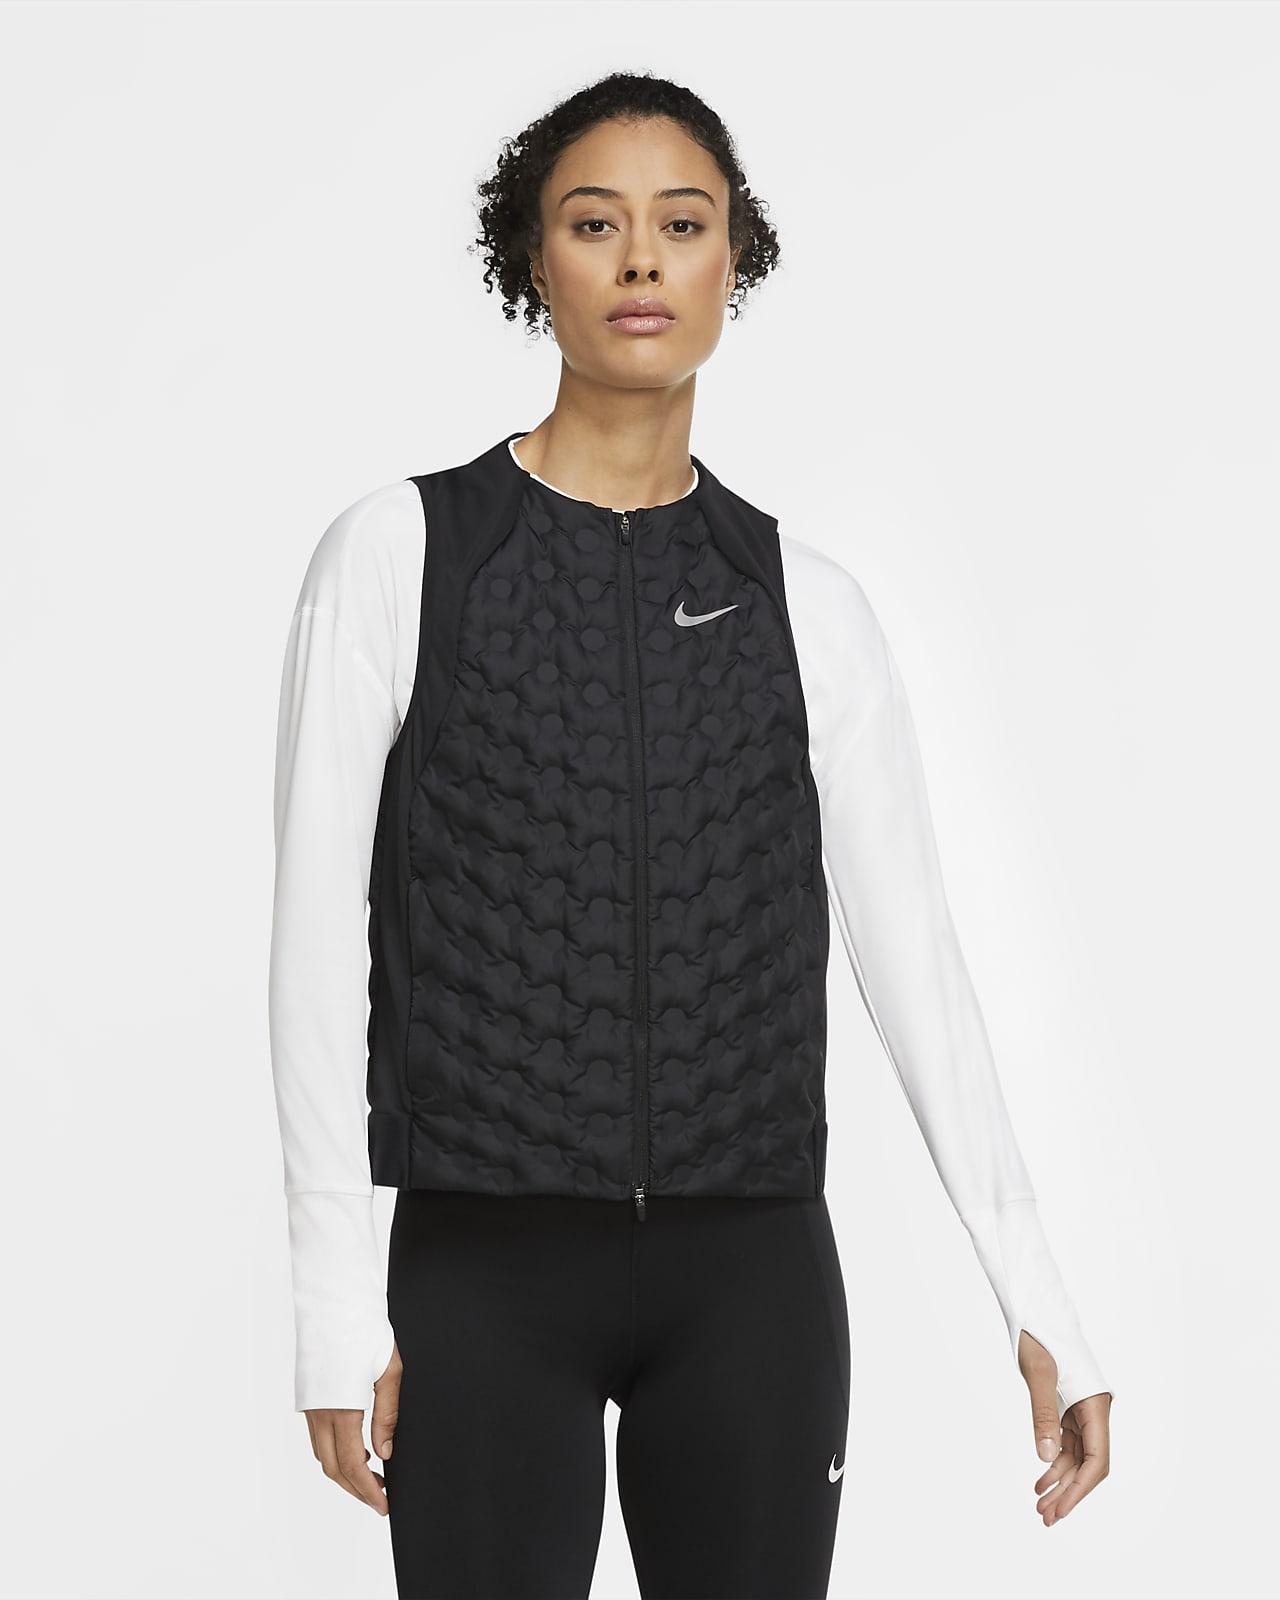 Chaleco de running para mujer Nike AeroLoft